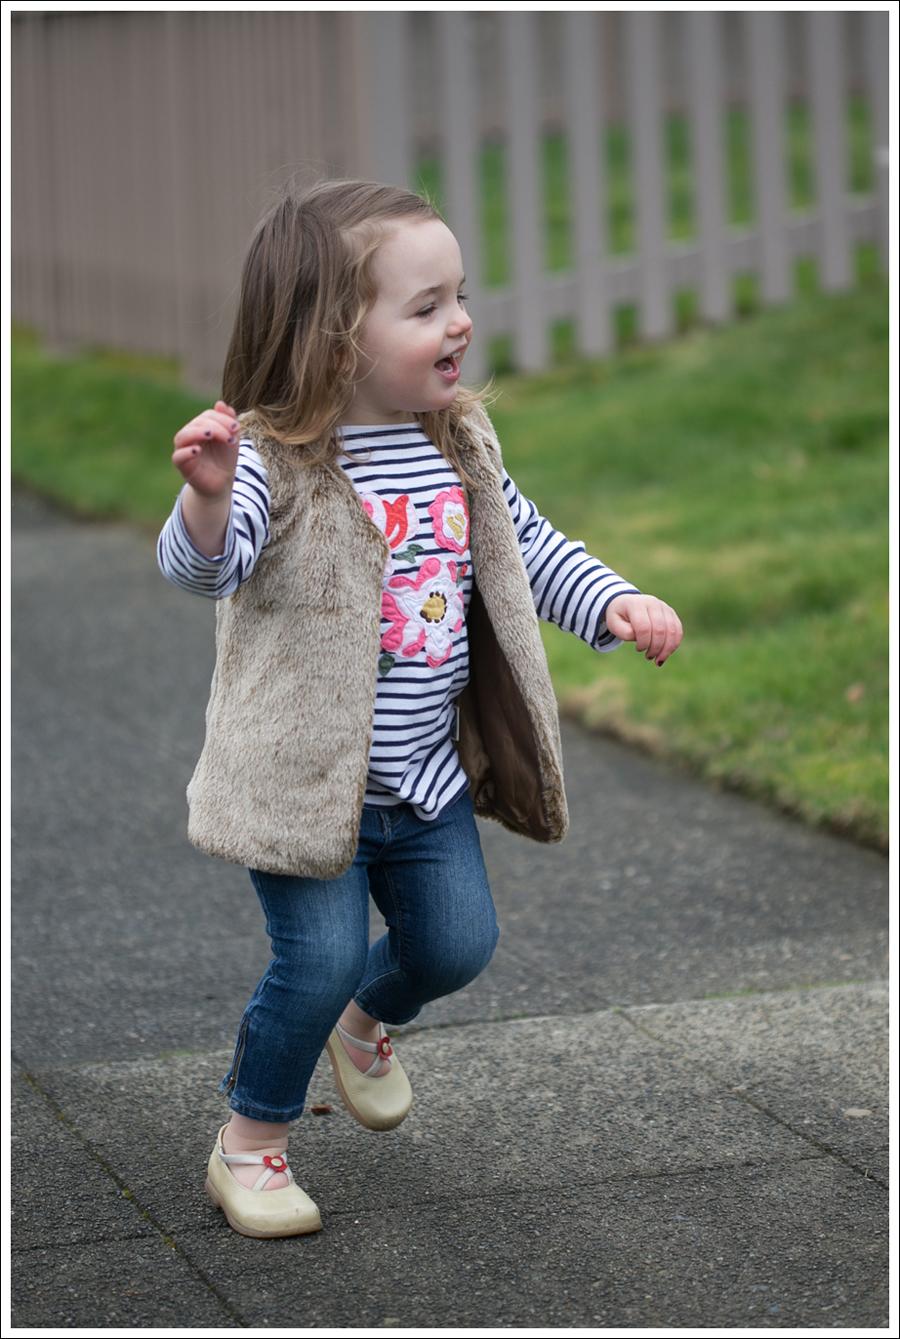 Blog Doma Leather Jacket Zara Joes Jeans Zipper Pura Lopez Oxfords-9